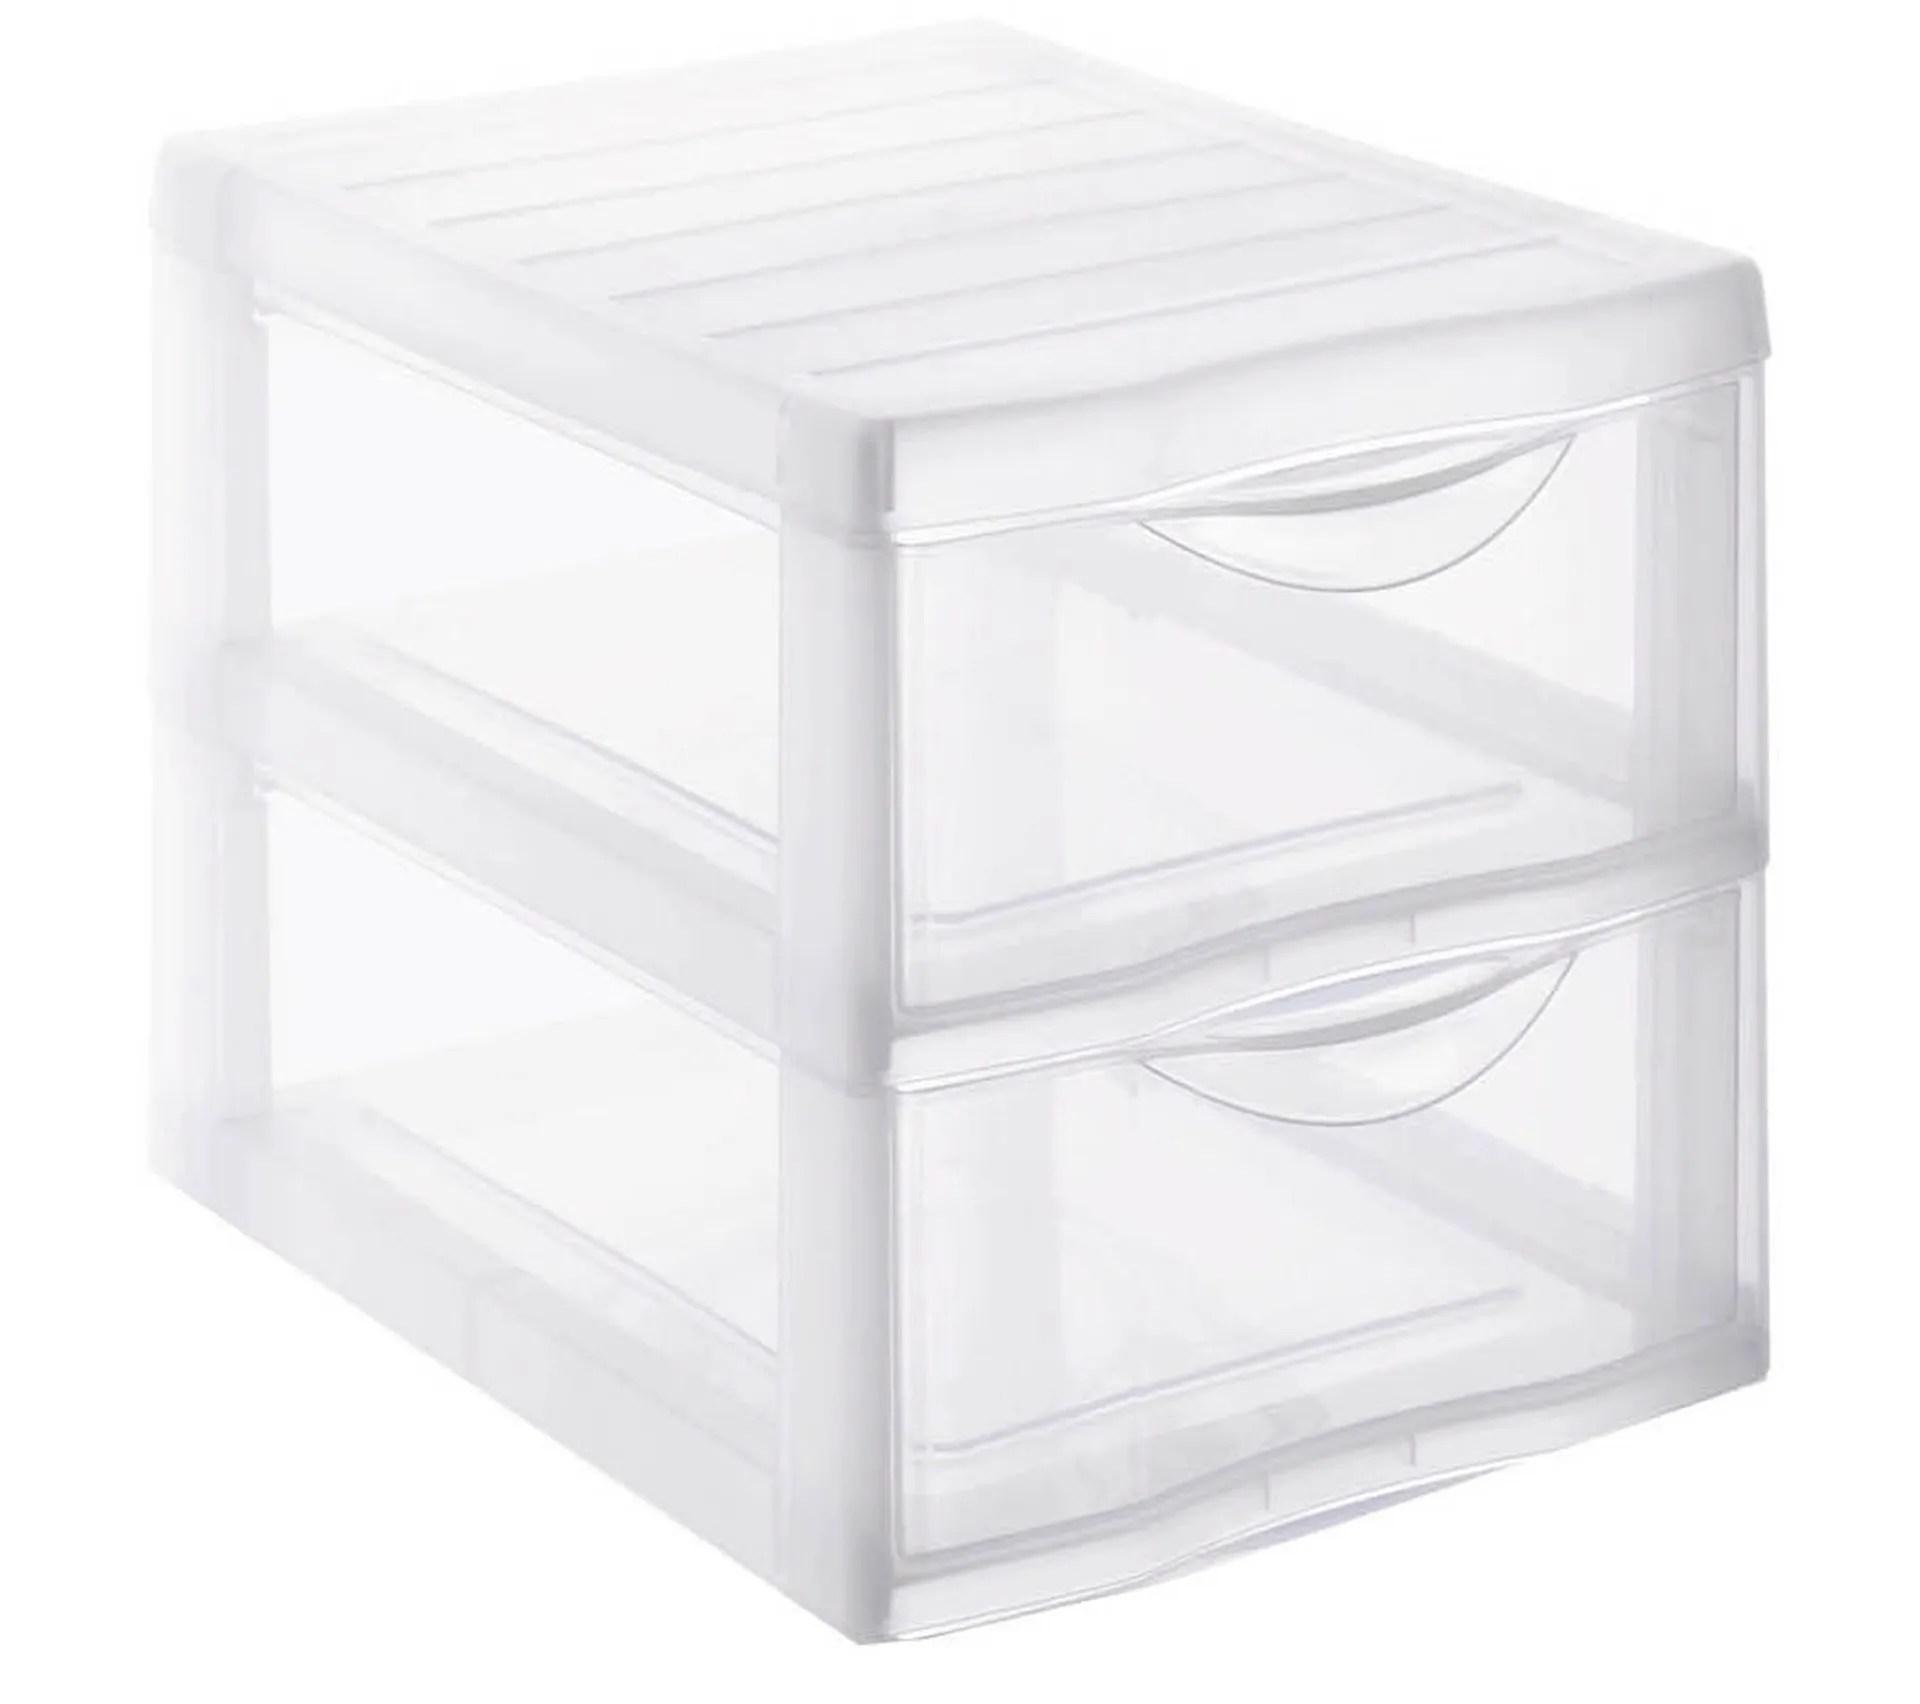 tour de rangement 2 tiroirs orgamix transparent